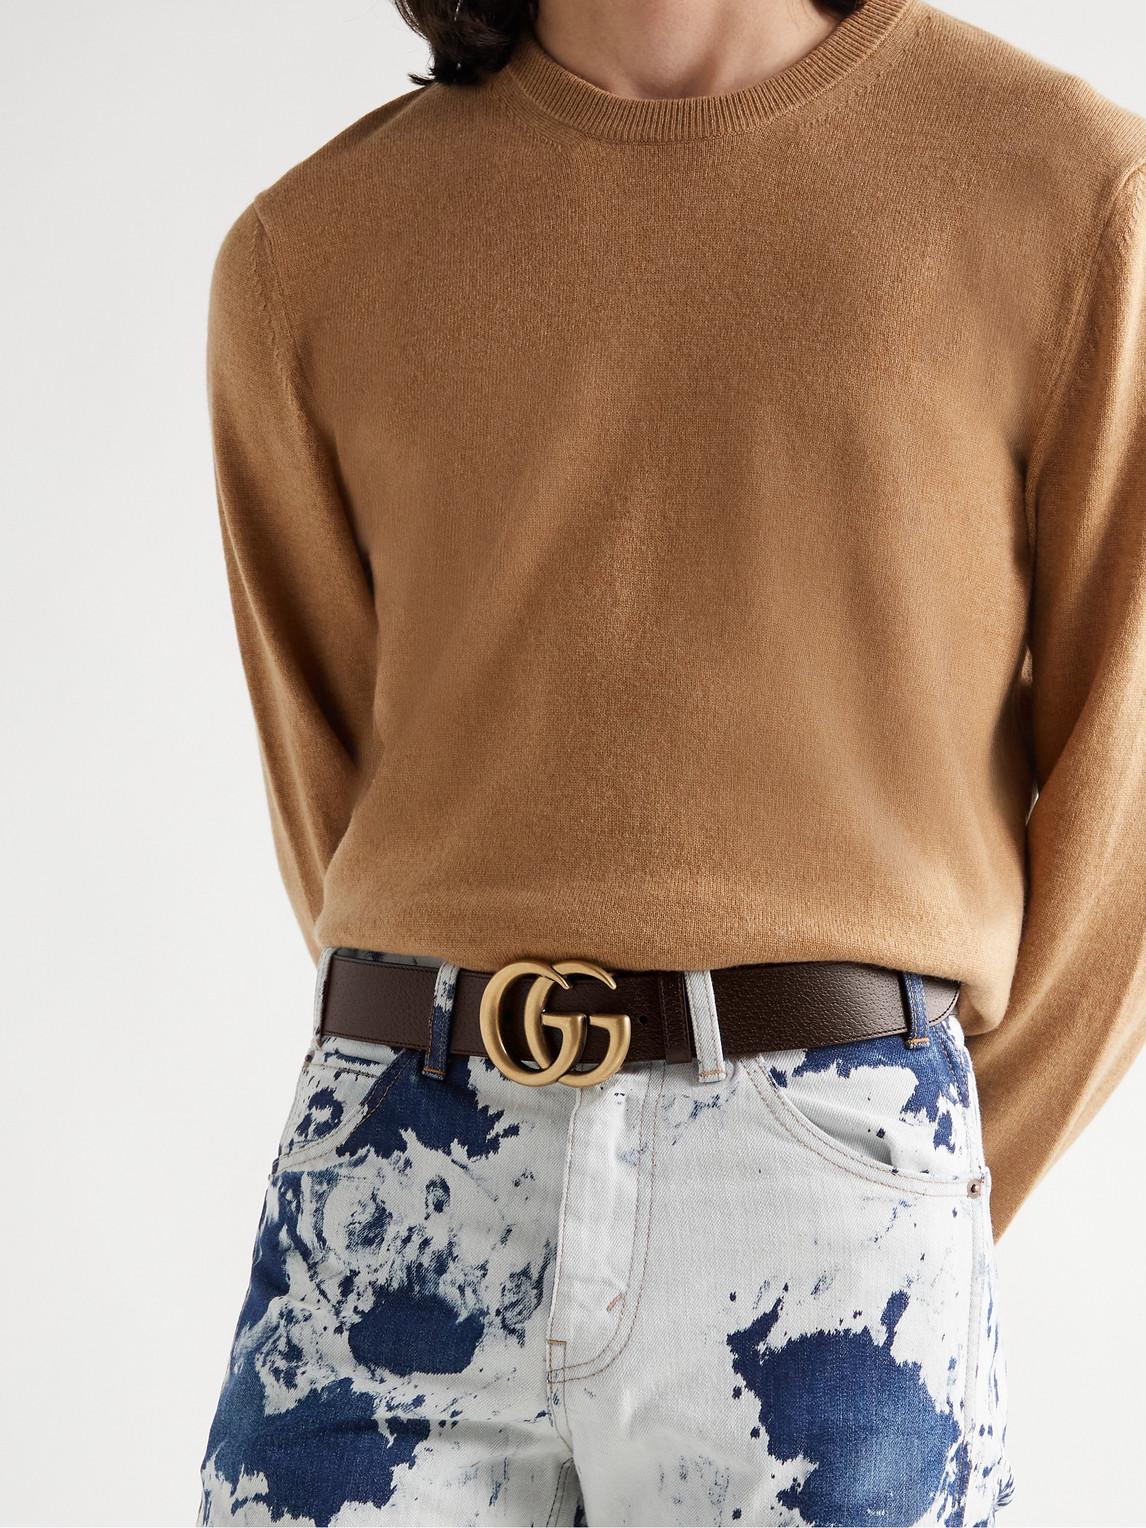 Gucci Belts 4CM BLACK FULL-GRAIN LEATHER BELT